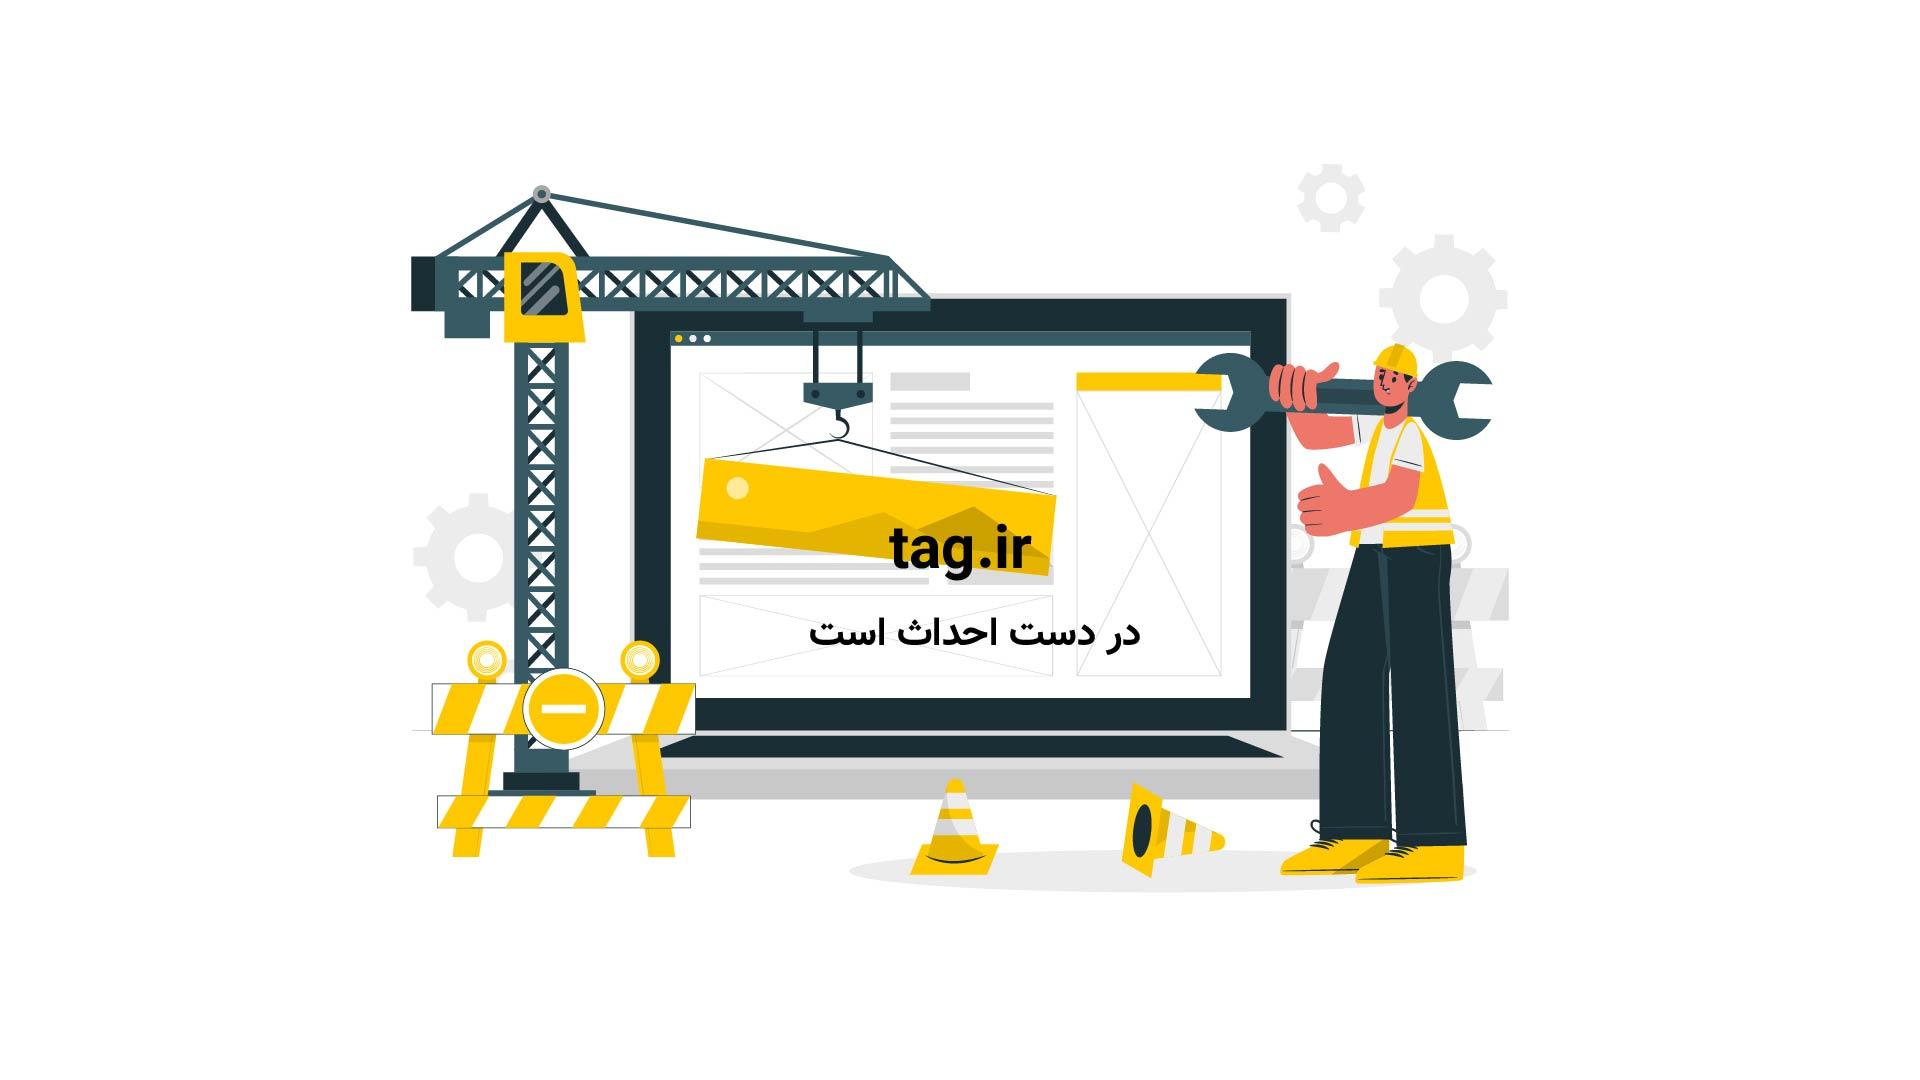 منفجر کردن خودرو انتحاری داعش | فیلم